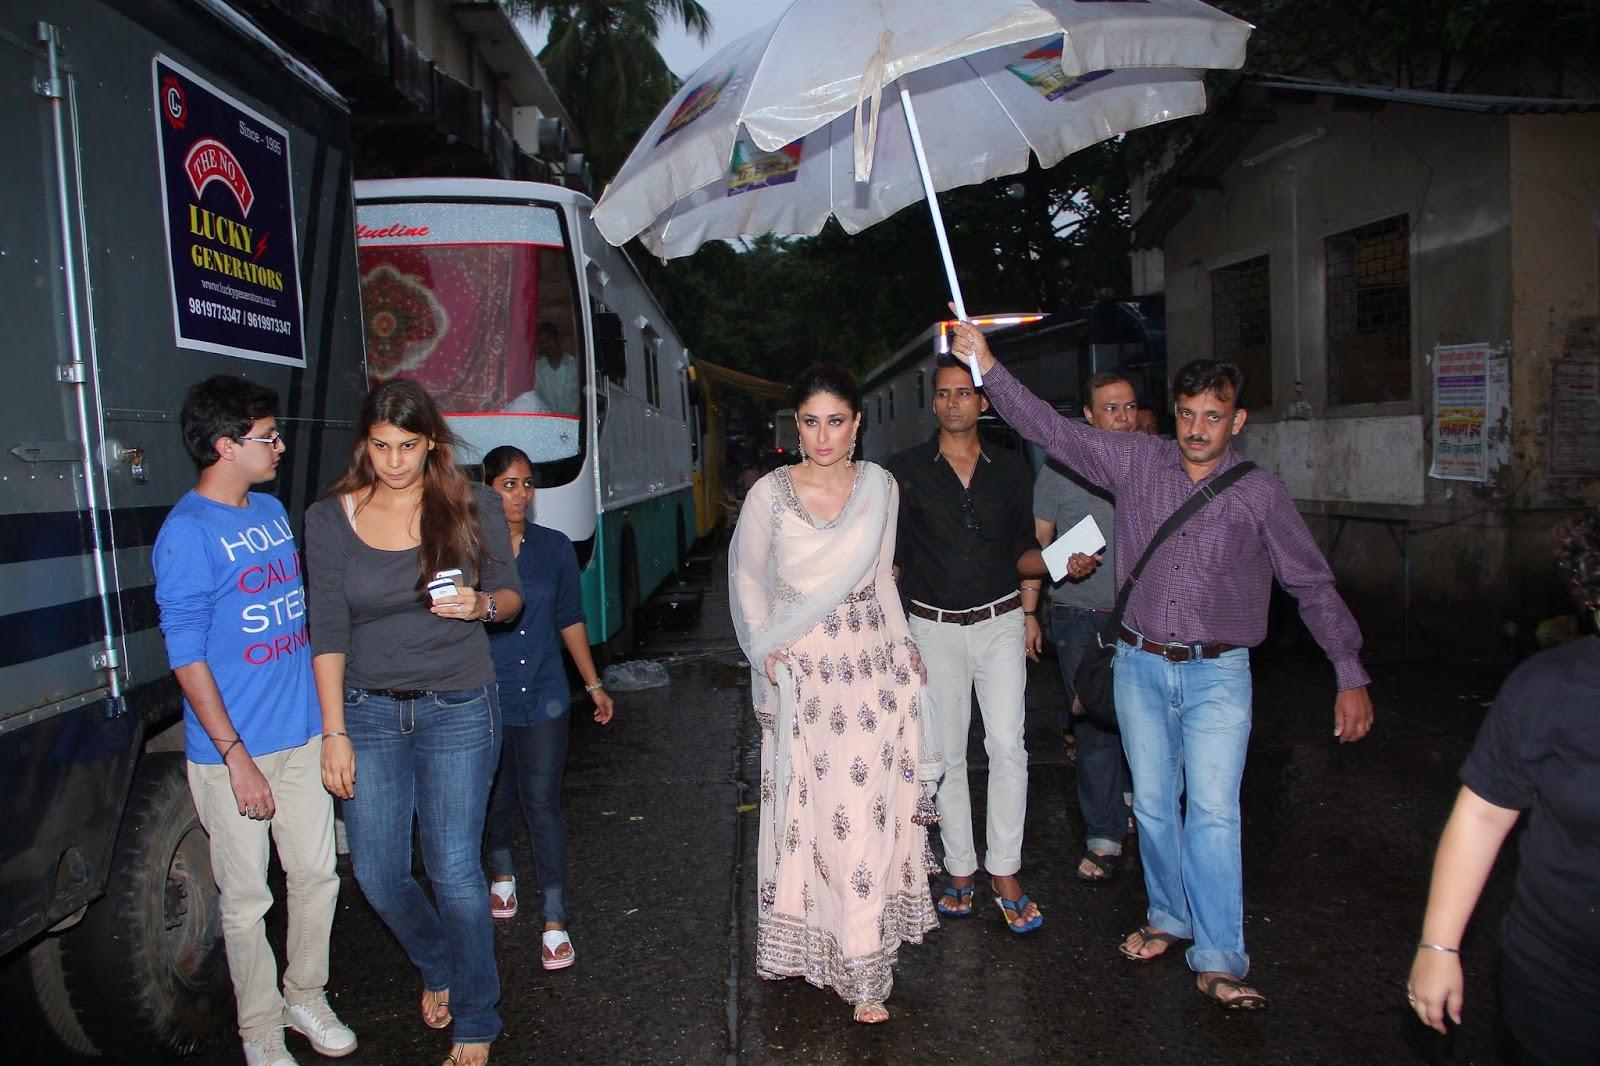 http://3.bp.blogspot.com/-VkP8Eynx02M/U9jSMlXFeJI/AAAAAAABwCI/PY4dJs7q7CU/s1600/Bollywood+Actress+Kareena+Kapoor+Promotes+her+upcoming+movie+%27Singham+Returns%27+On+Jhalak+Dikhhla+Jaa+7+gallery.+(15).JPG